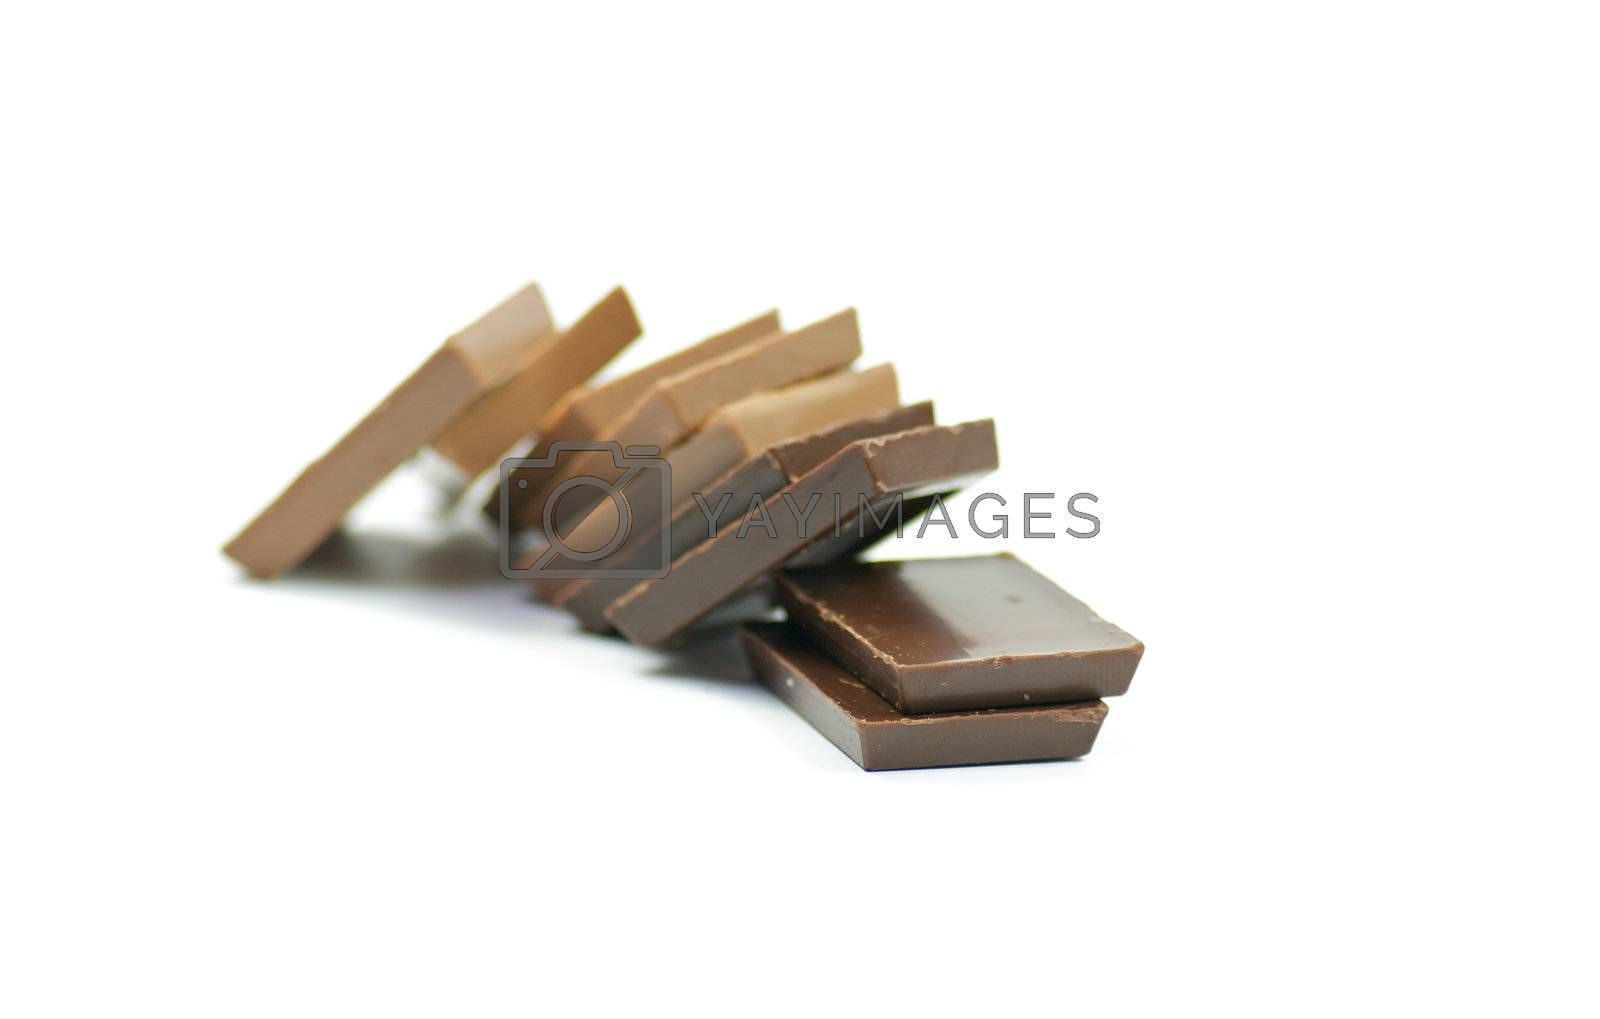 Pyramid from milk and dark chocolate on white background